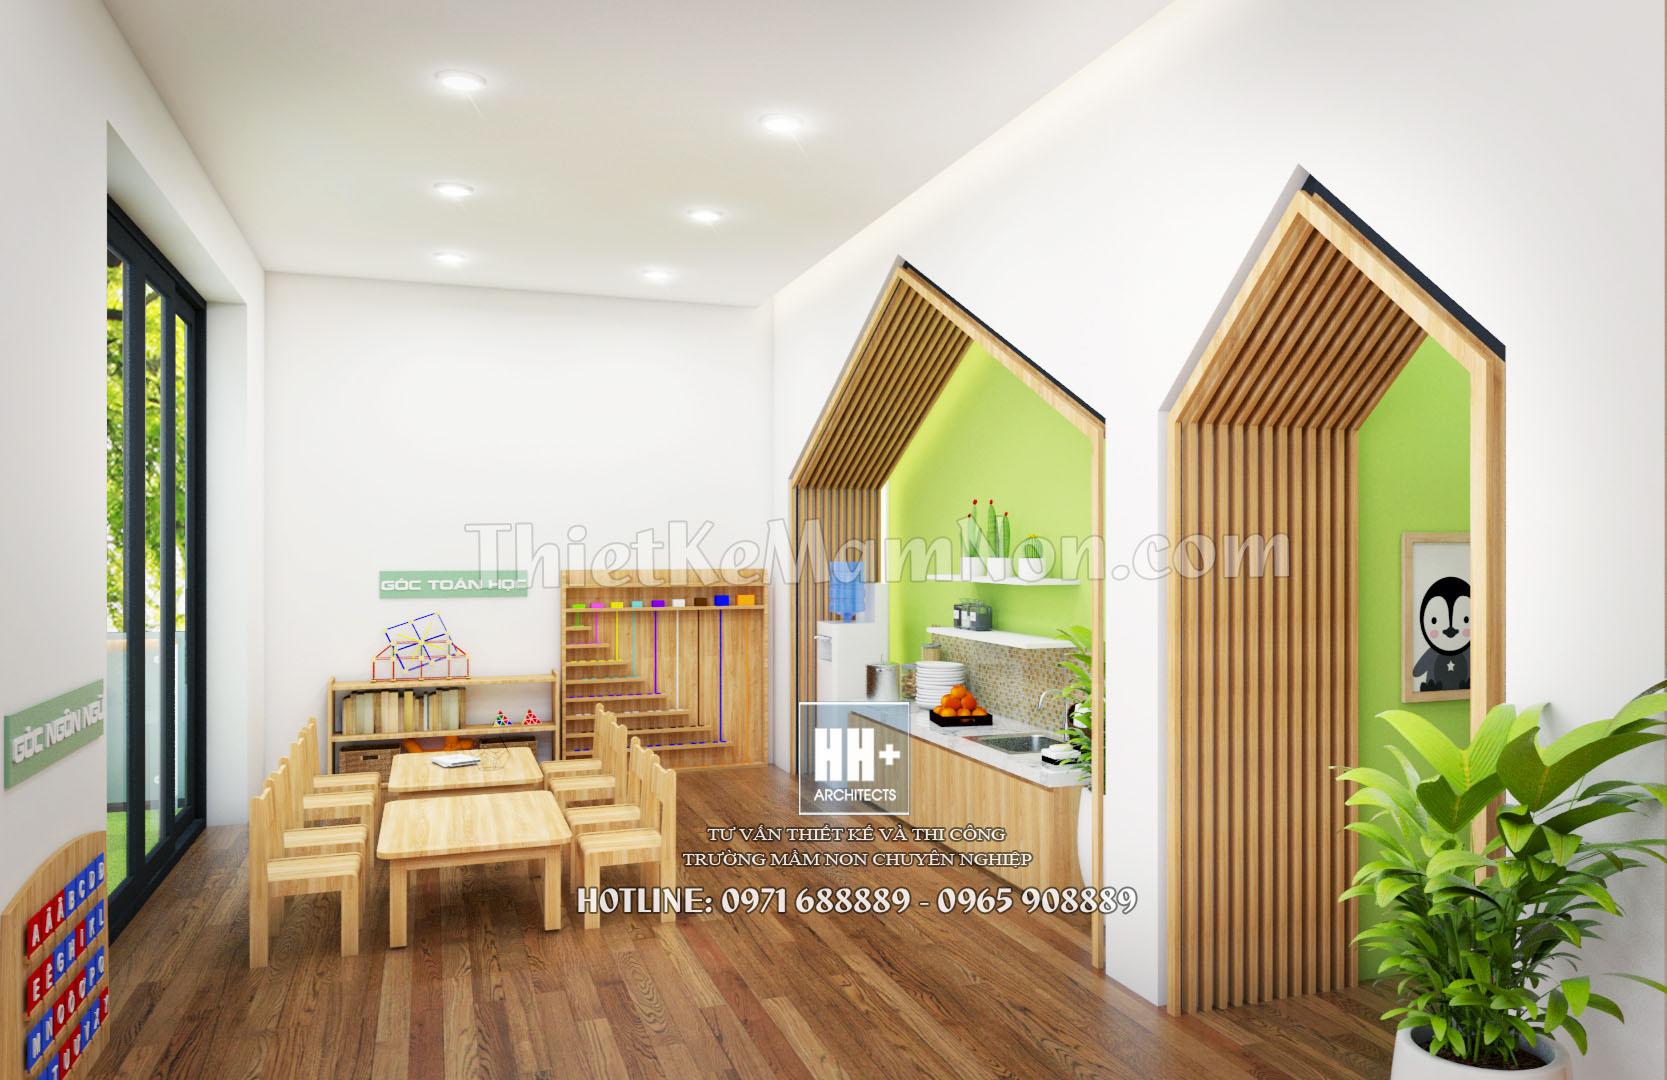 12 thiết kế trường mầm non montessori Thiết kế trường mầm non montessori Việt Anh 12 2